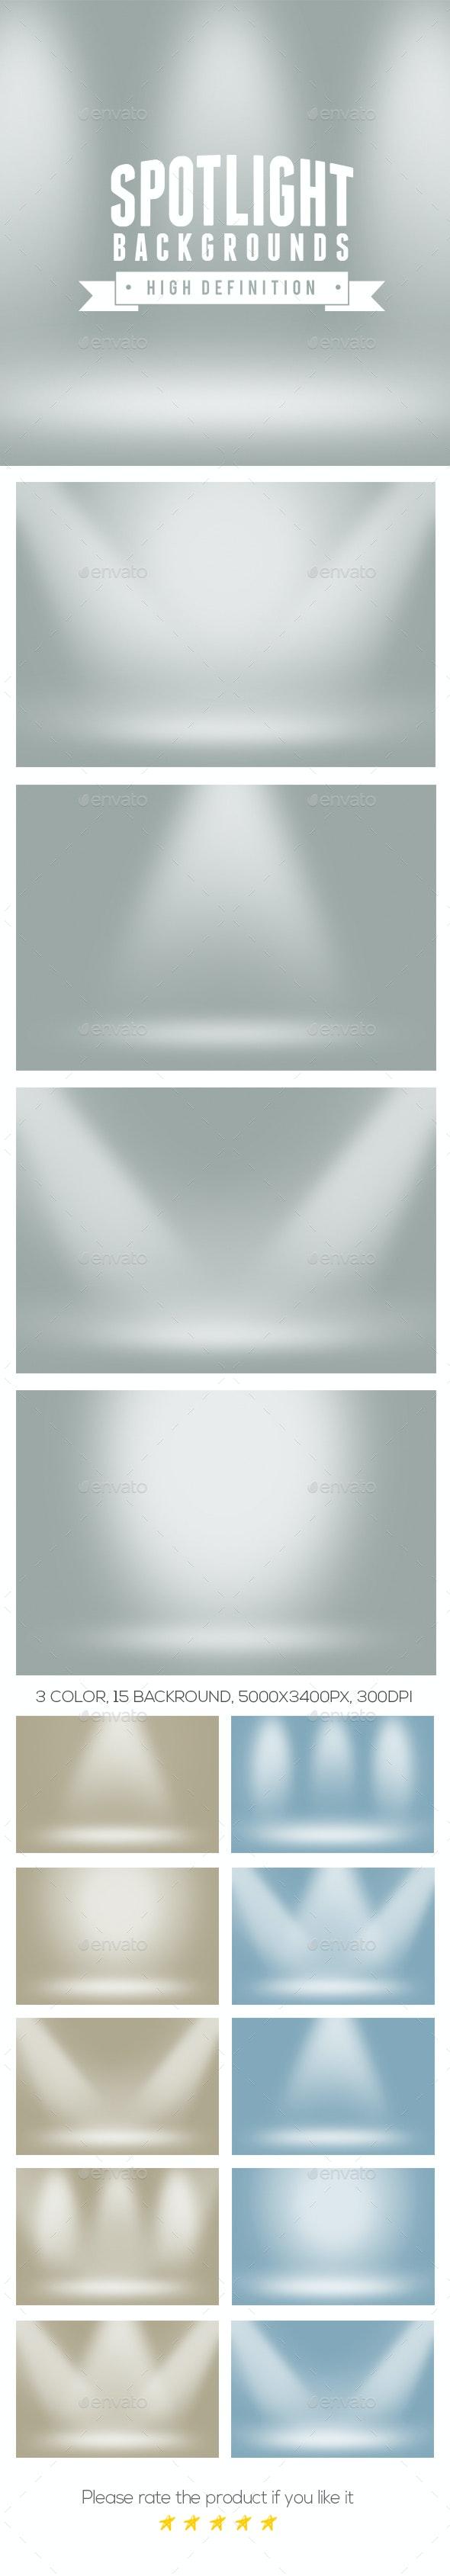 Spotlight Backgrounds - Backgrounds Graphics